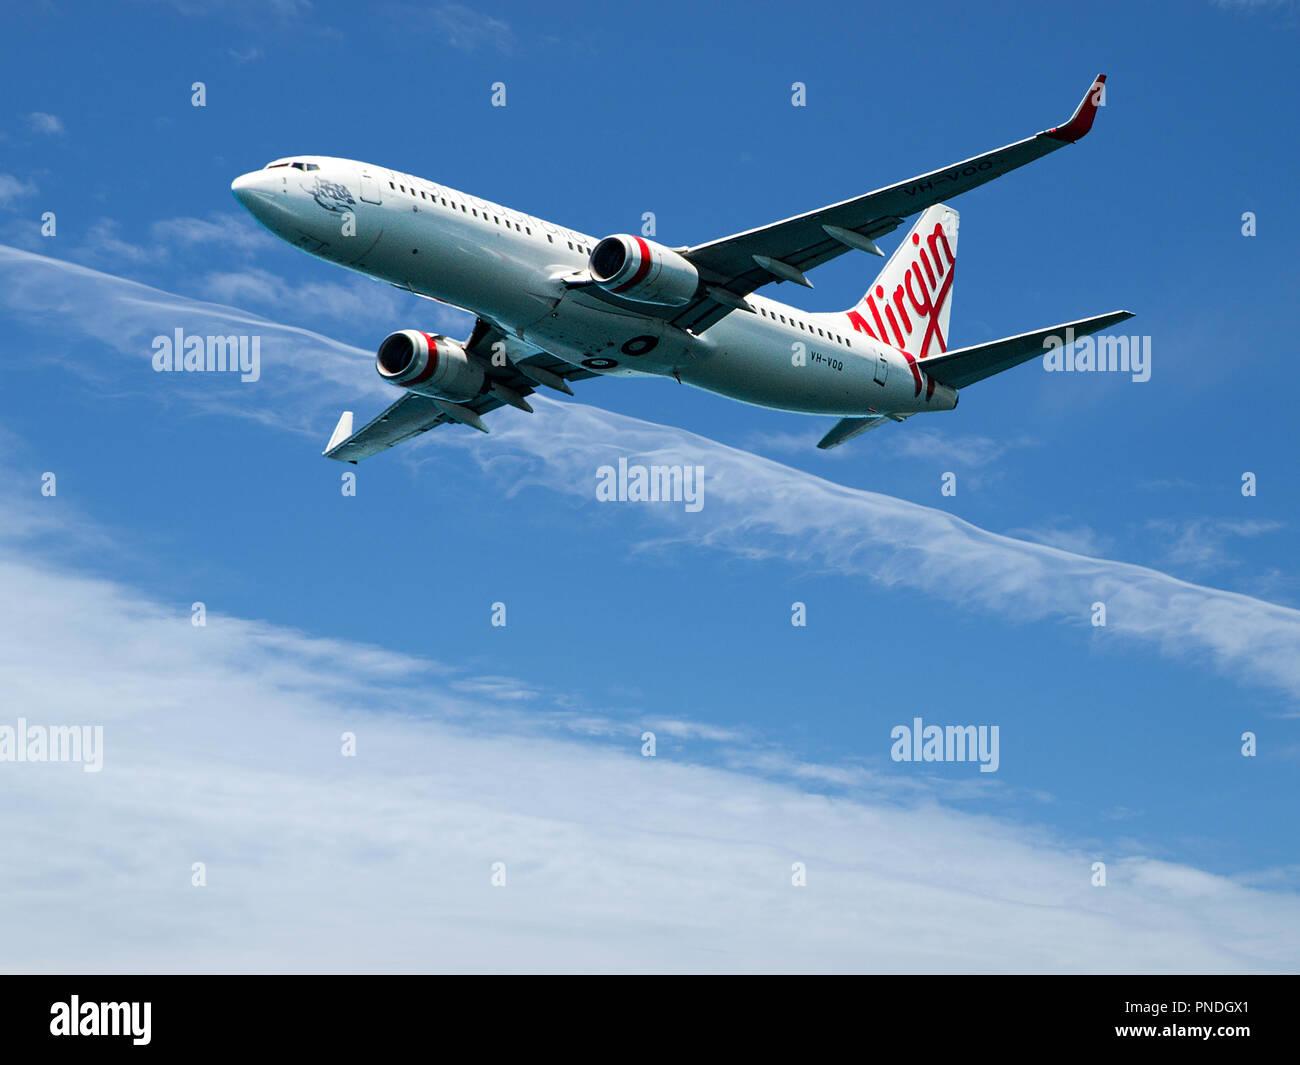 Sydney, New South Wales, Australia - October 4. 2014: Virgin Australia commercial passenger jet aircraft in flight closeup departing Sydney - Stock Image